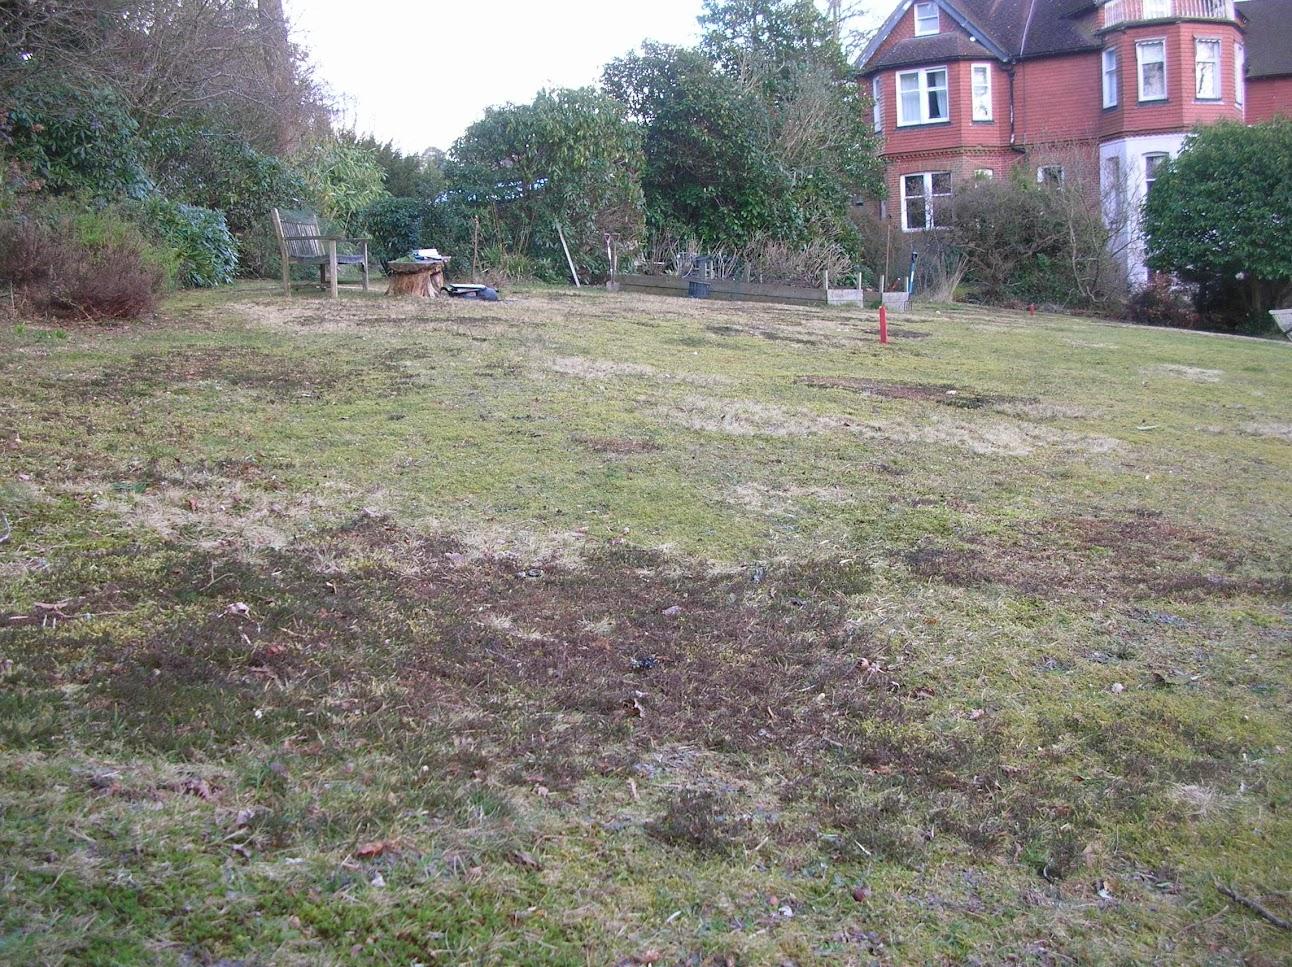 Photo 1 / 1 - Low-maintenance, Acid-heath Lawn